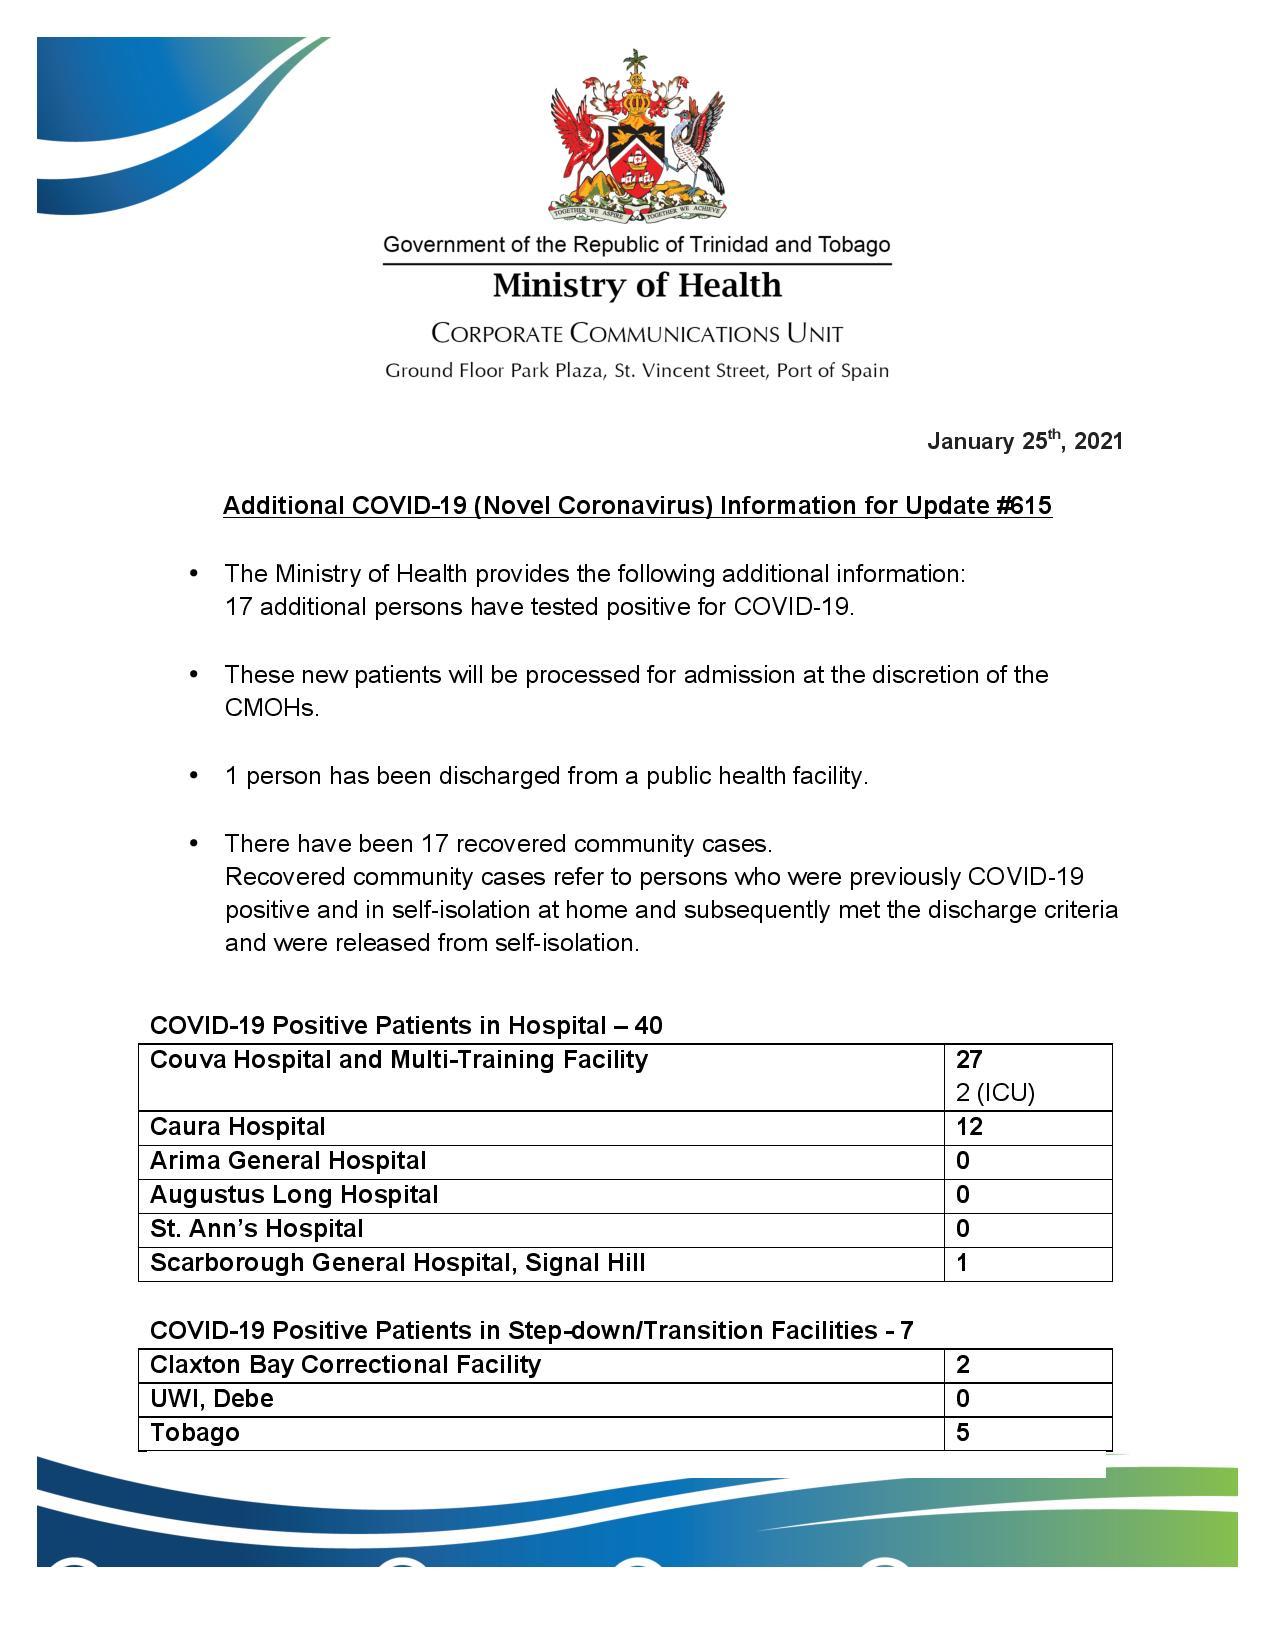 COVID-19 UPDATE - Sunday 24th January 2021